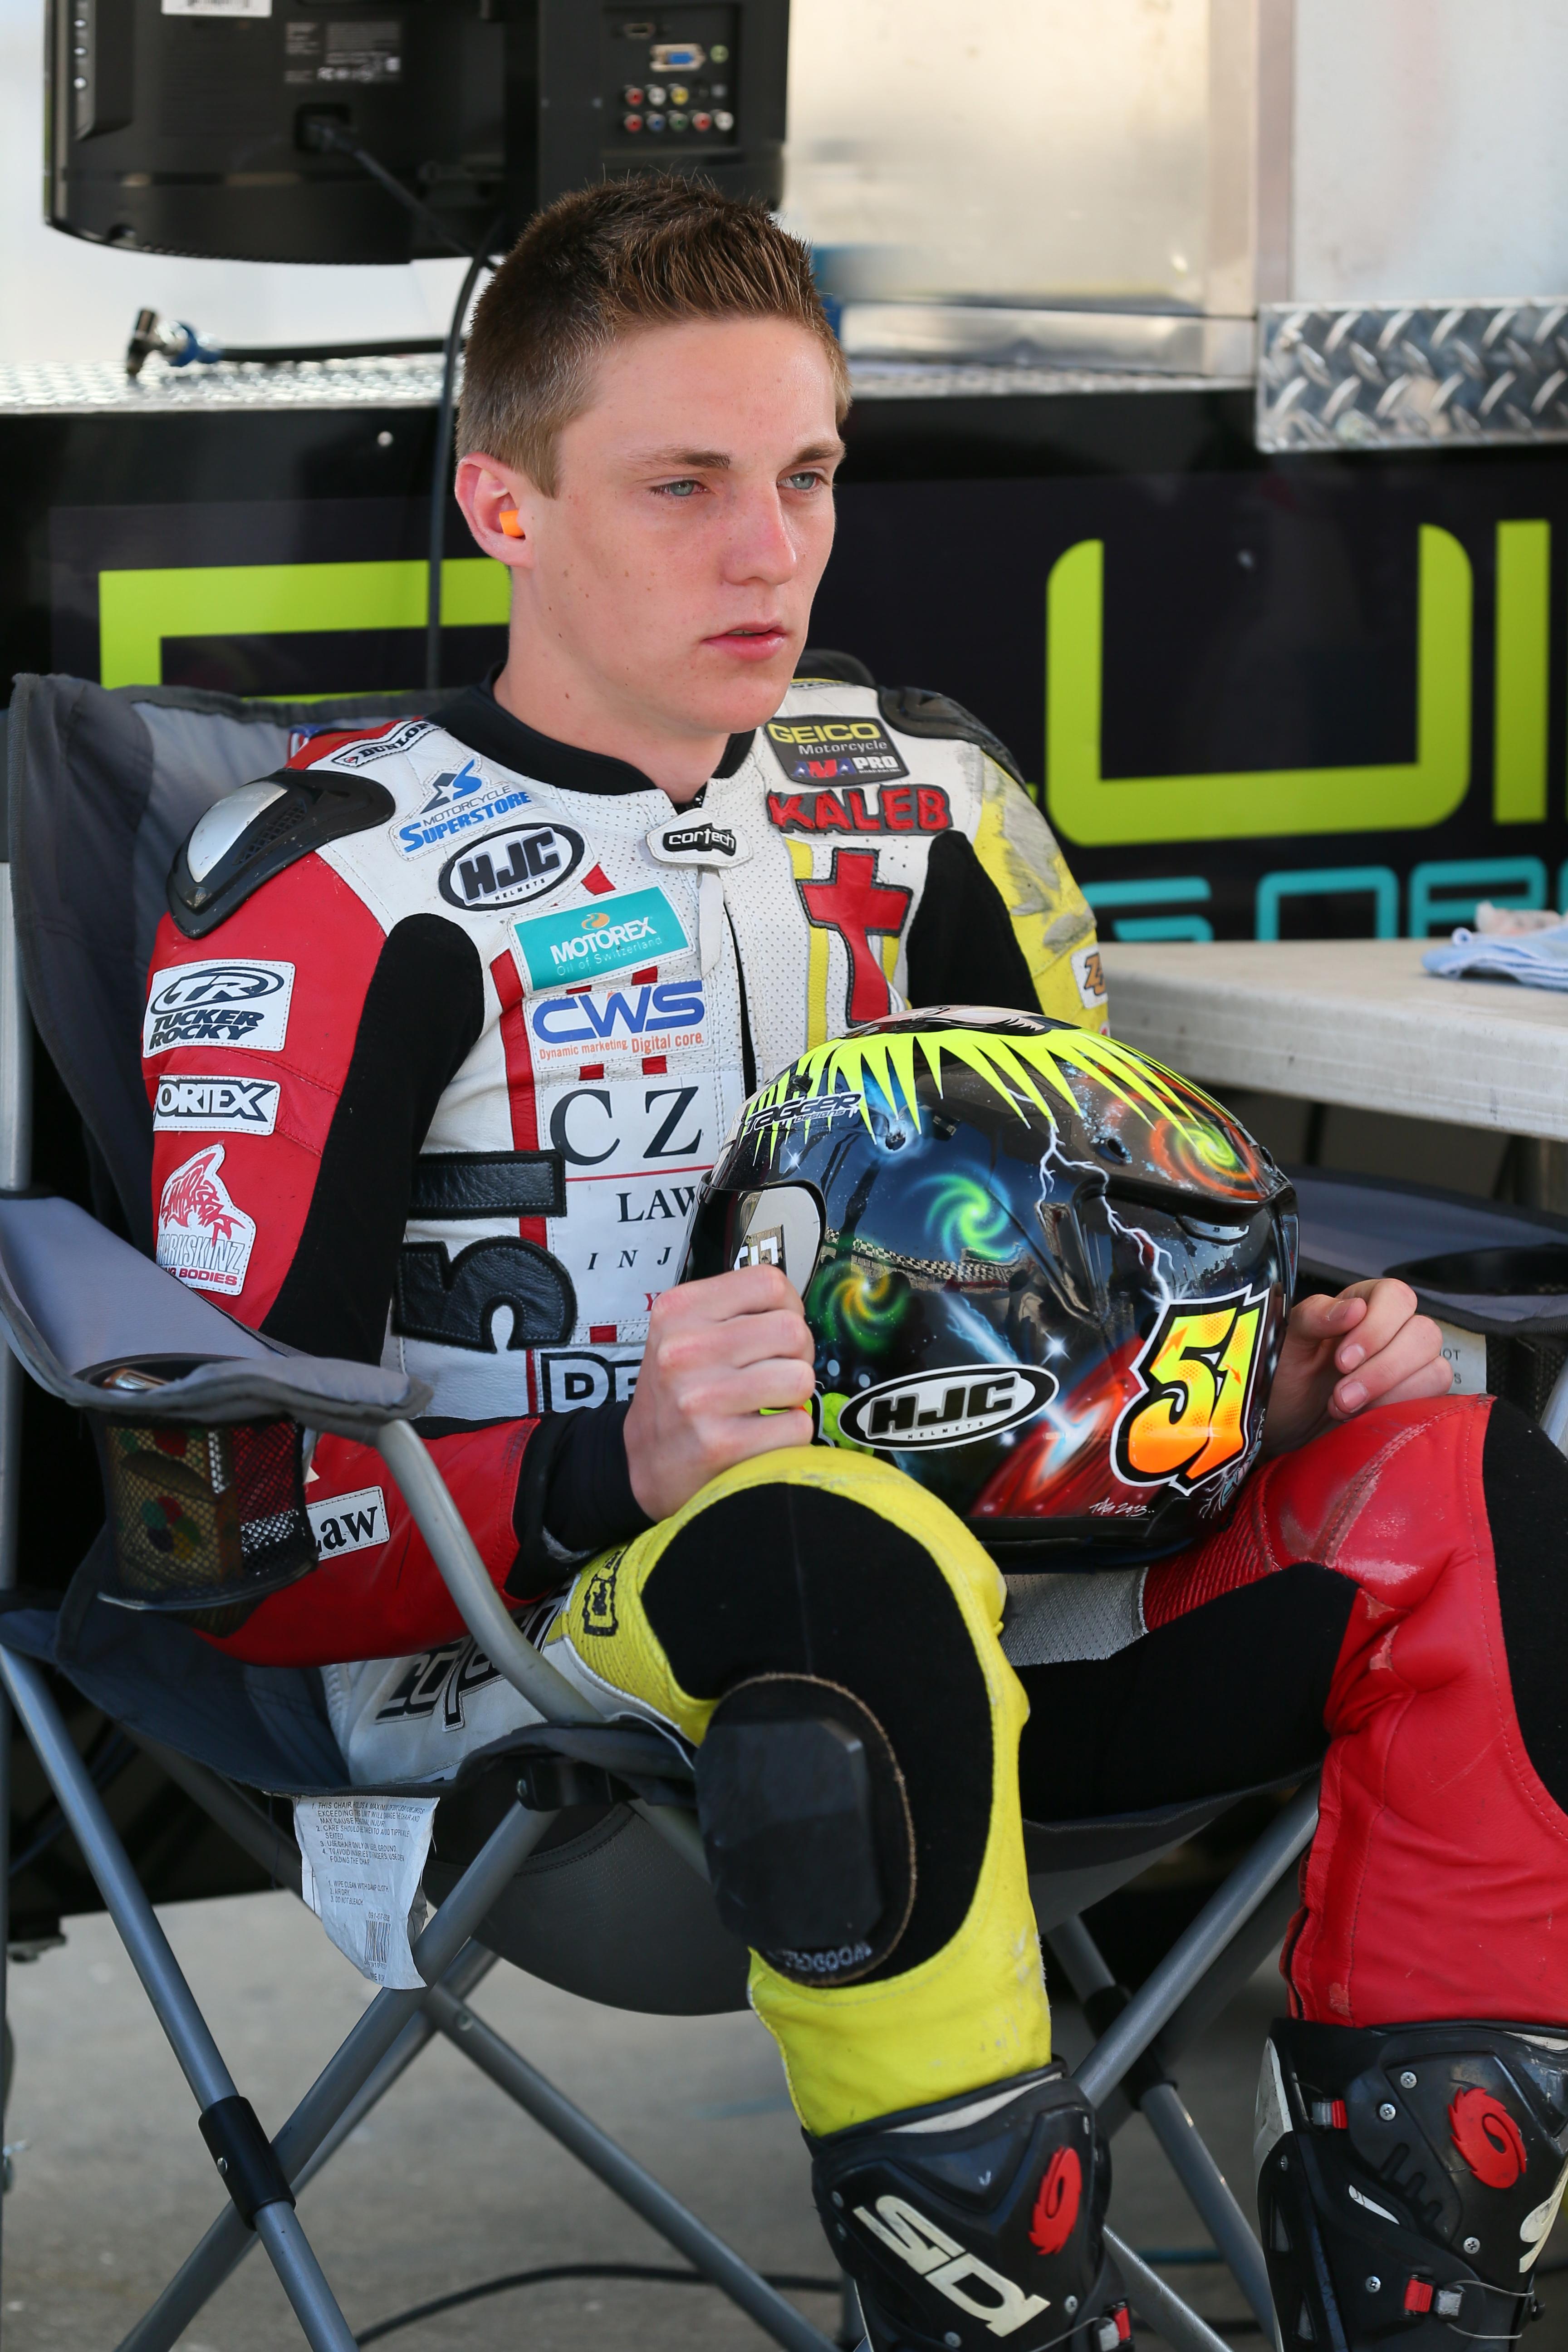 De Keyrel Racing - Motorcycle Racing Minnesota - Motocross